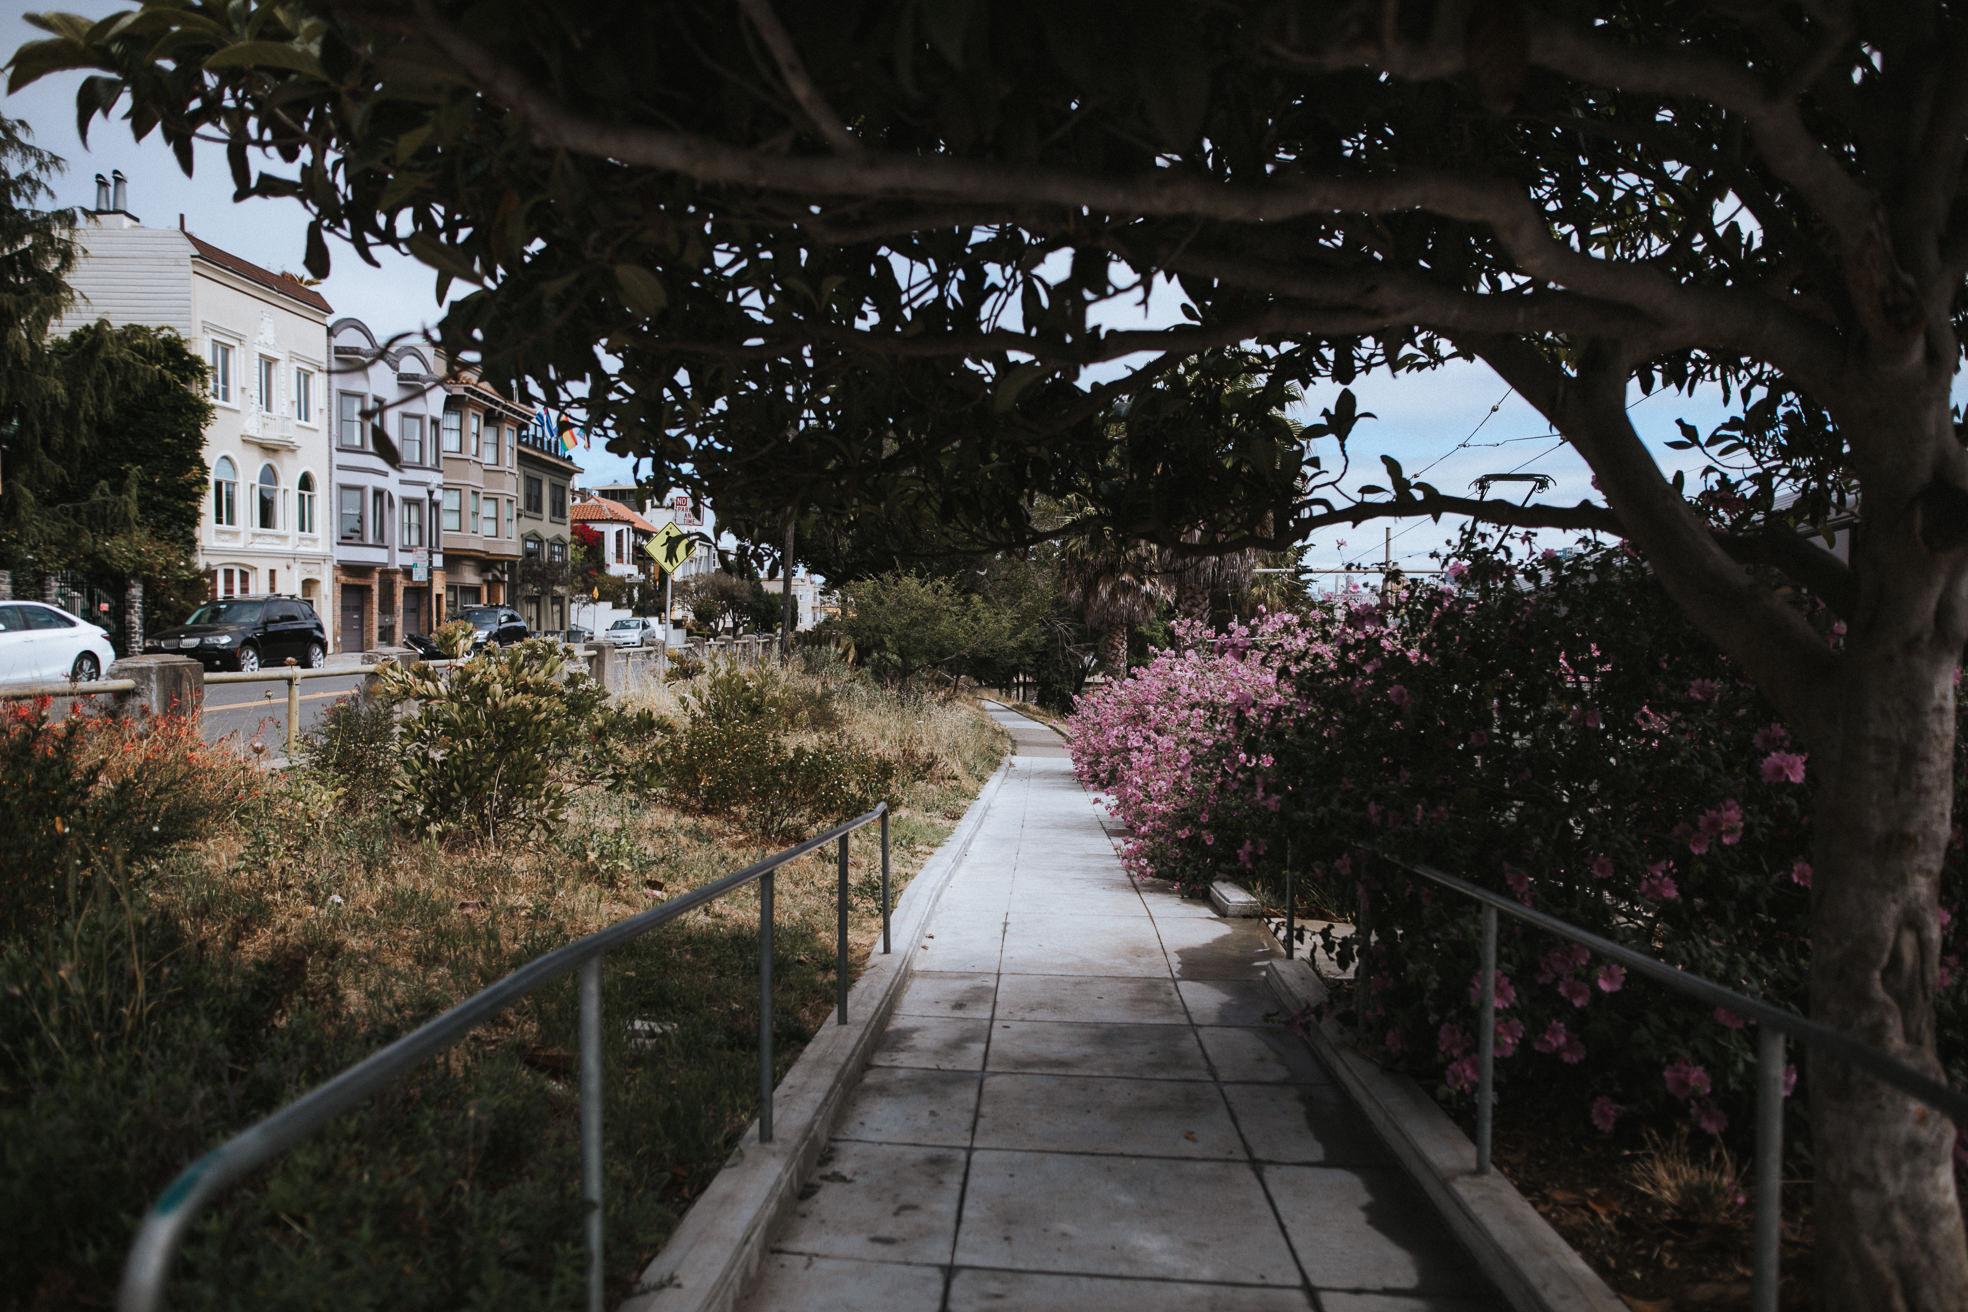 San-Francisco-BildervomLeben-4856